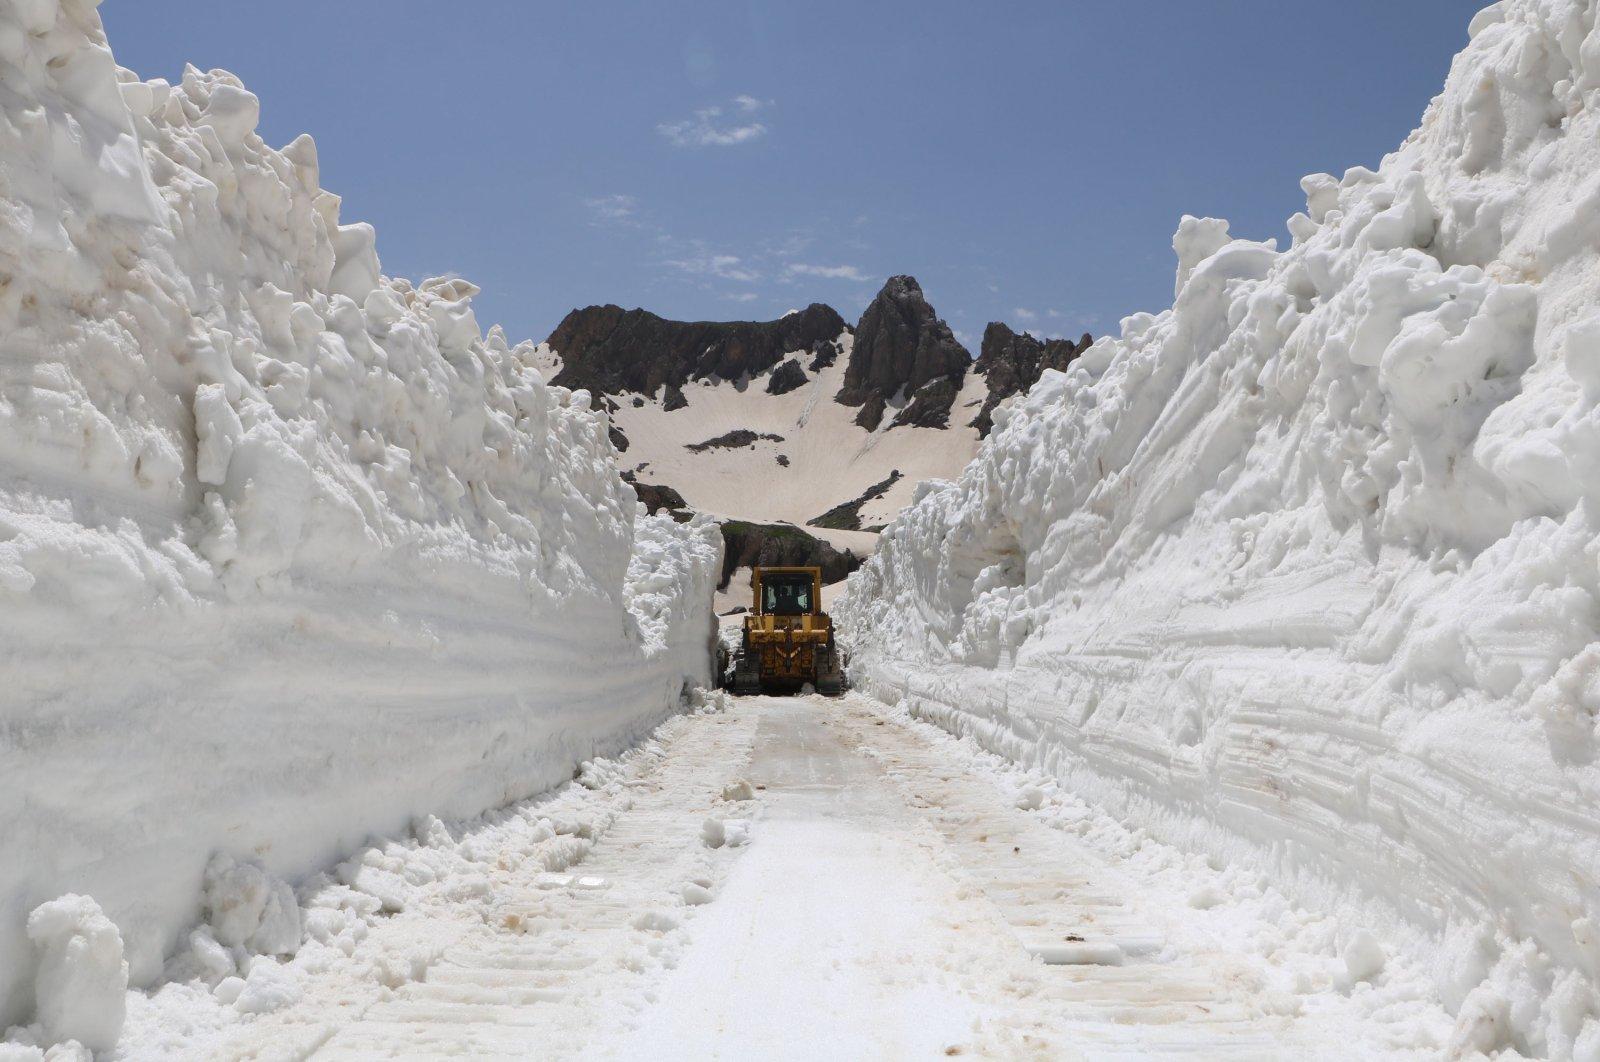 A snowplow rolls through columns of snow in Yüksekova district, in Hakkari, Turkey, June 18, 2020. (DHA Photo)